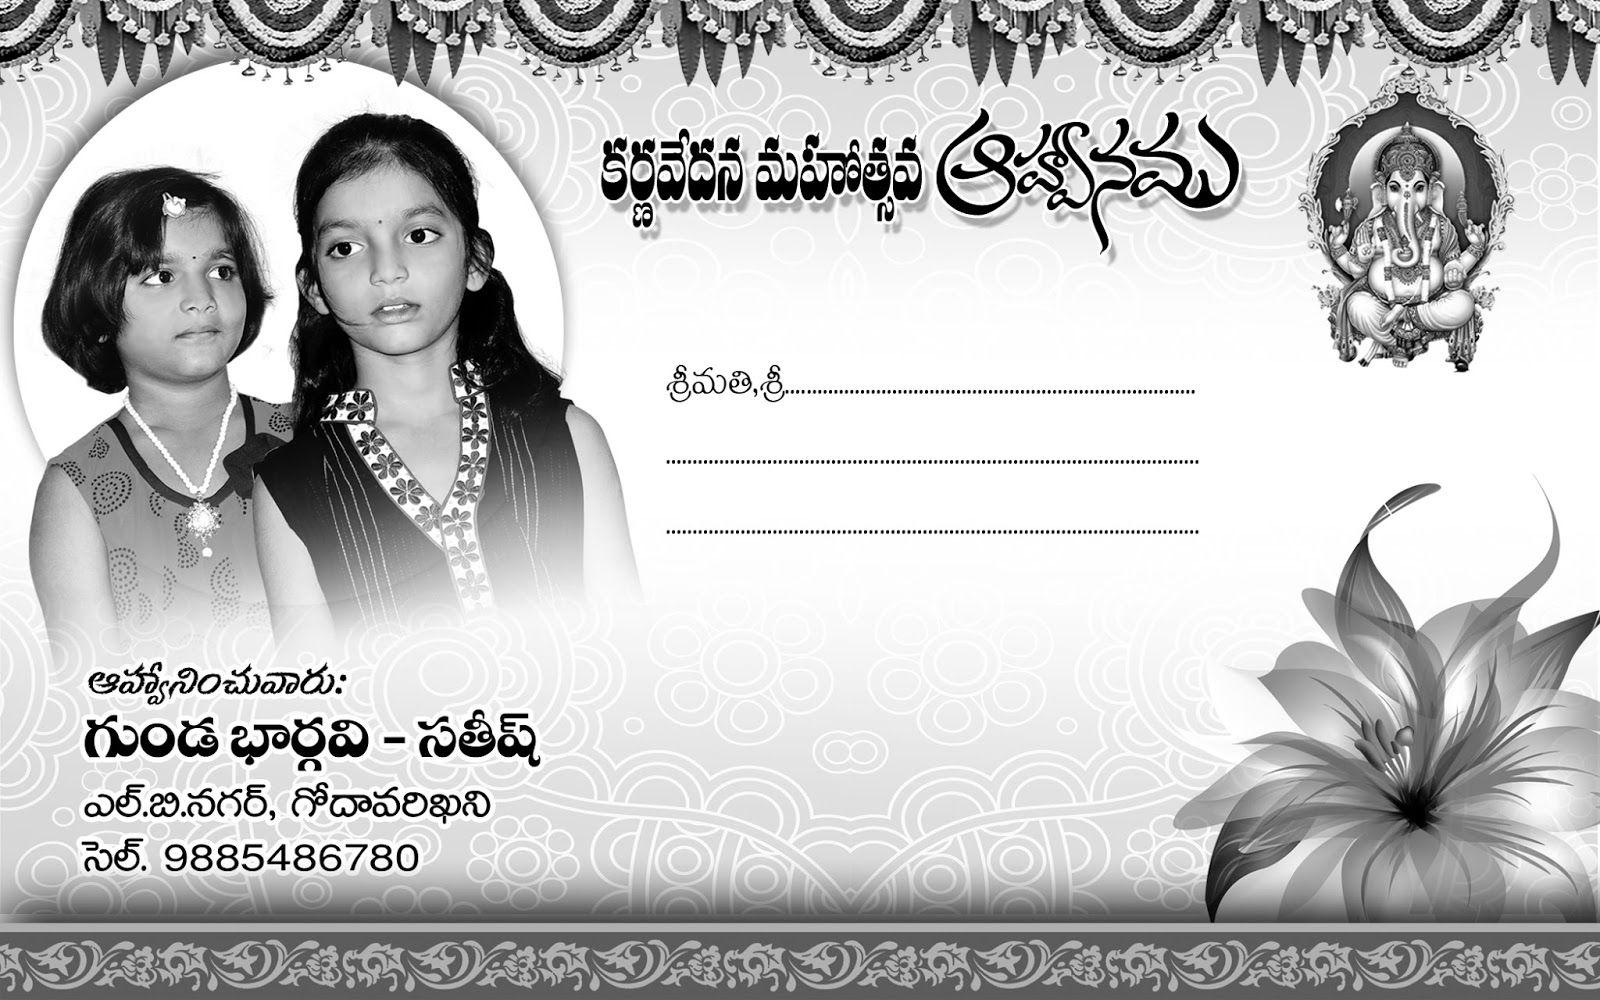 Naveengfx Karnavedanam Invitation Card Design Birthday Card Template Invitation Card Design Invitations